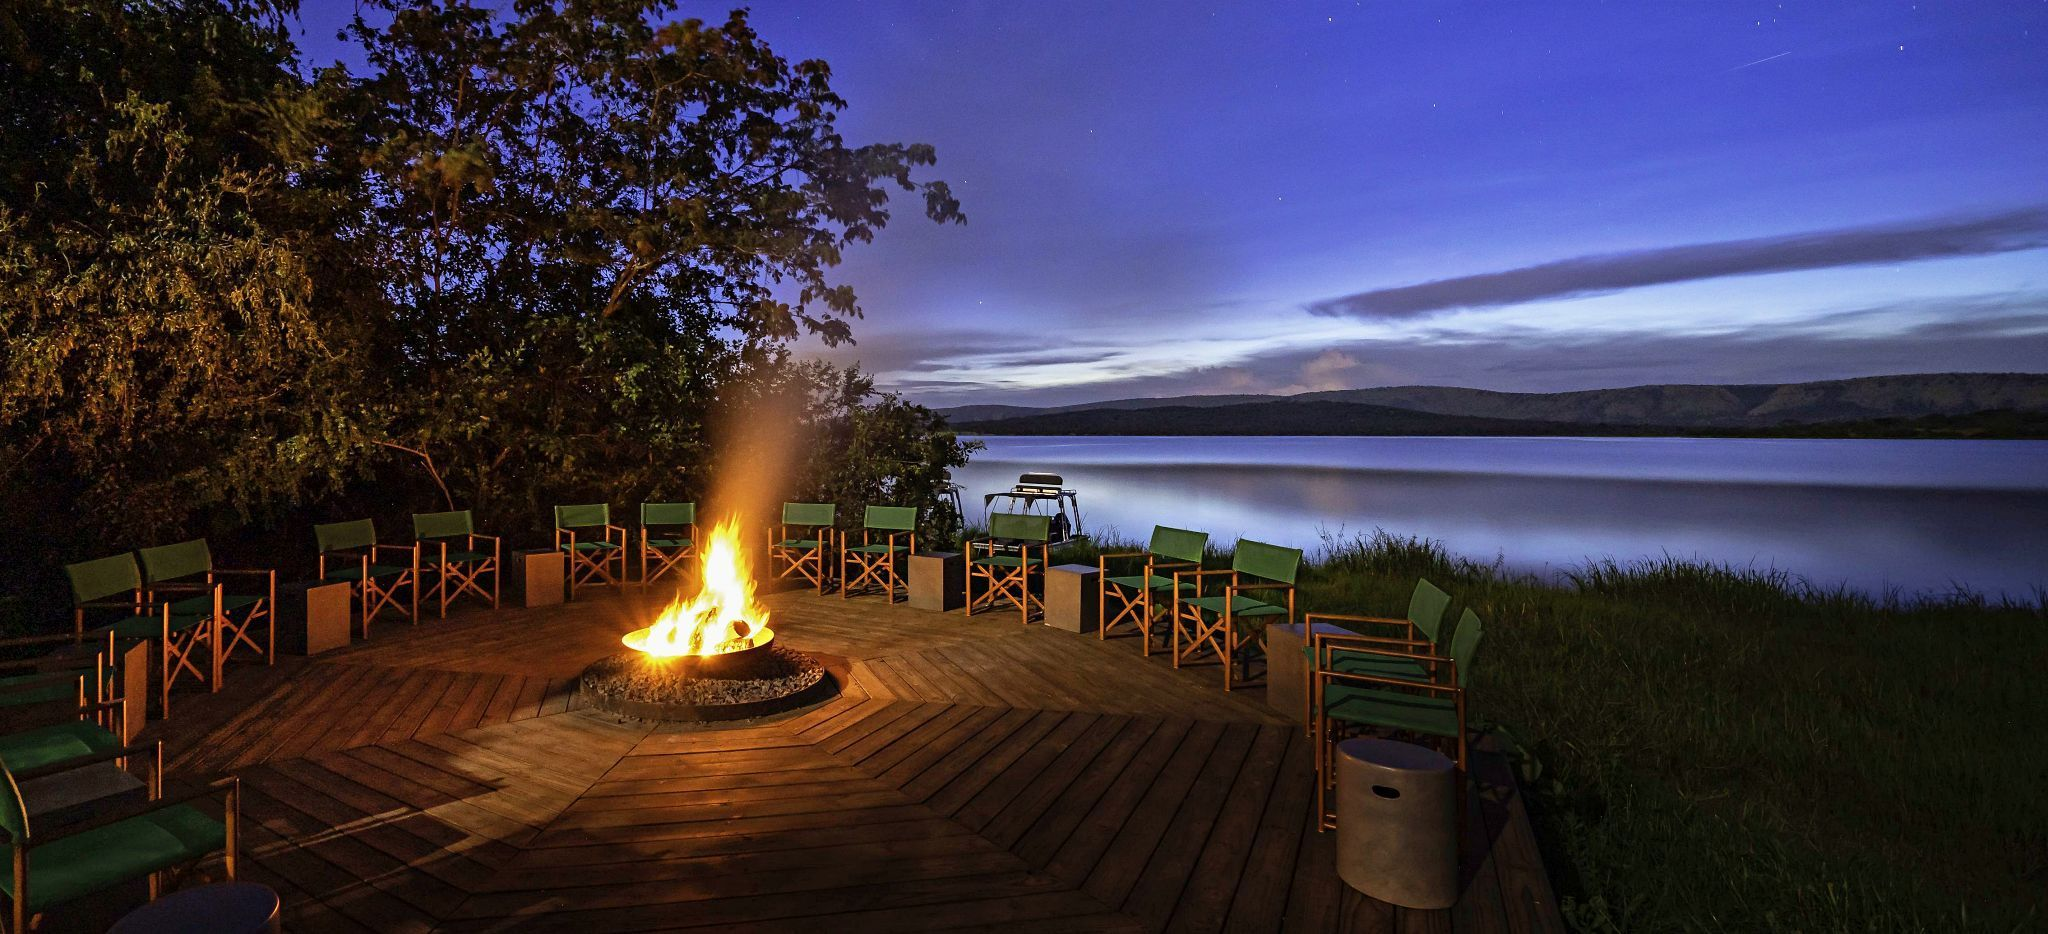 Feuerstelle des Magashi Camps, Ruanda, mit Blick auf den See Rwanyakazinga